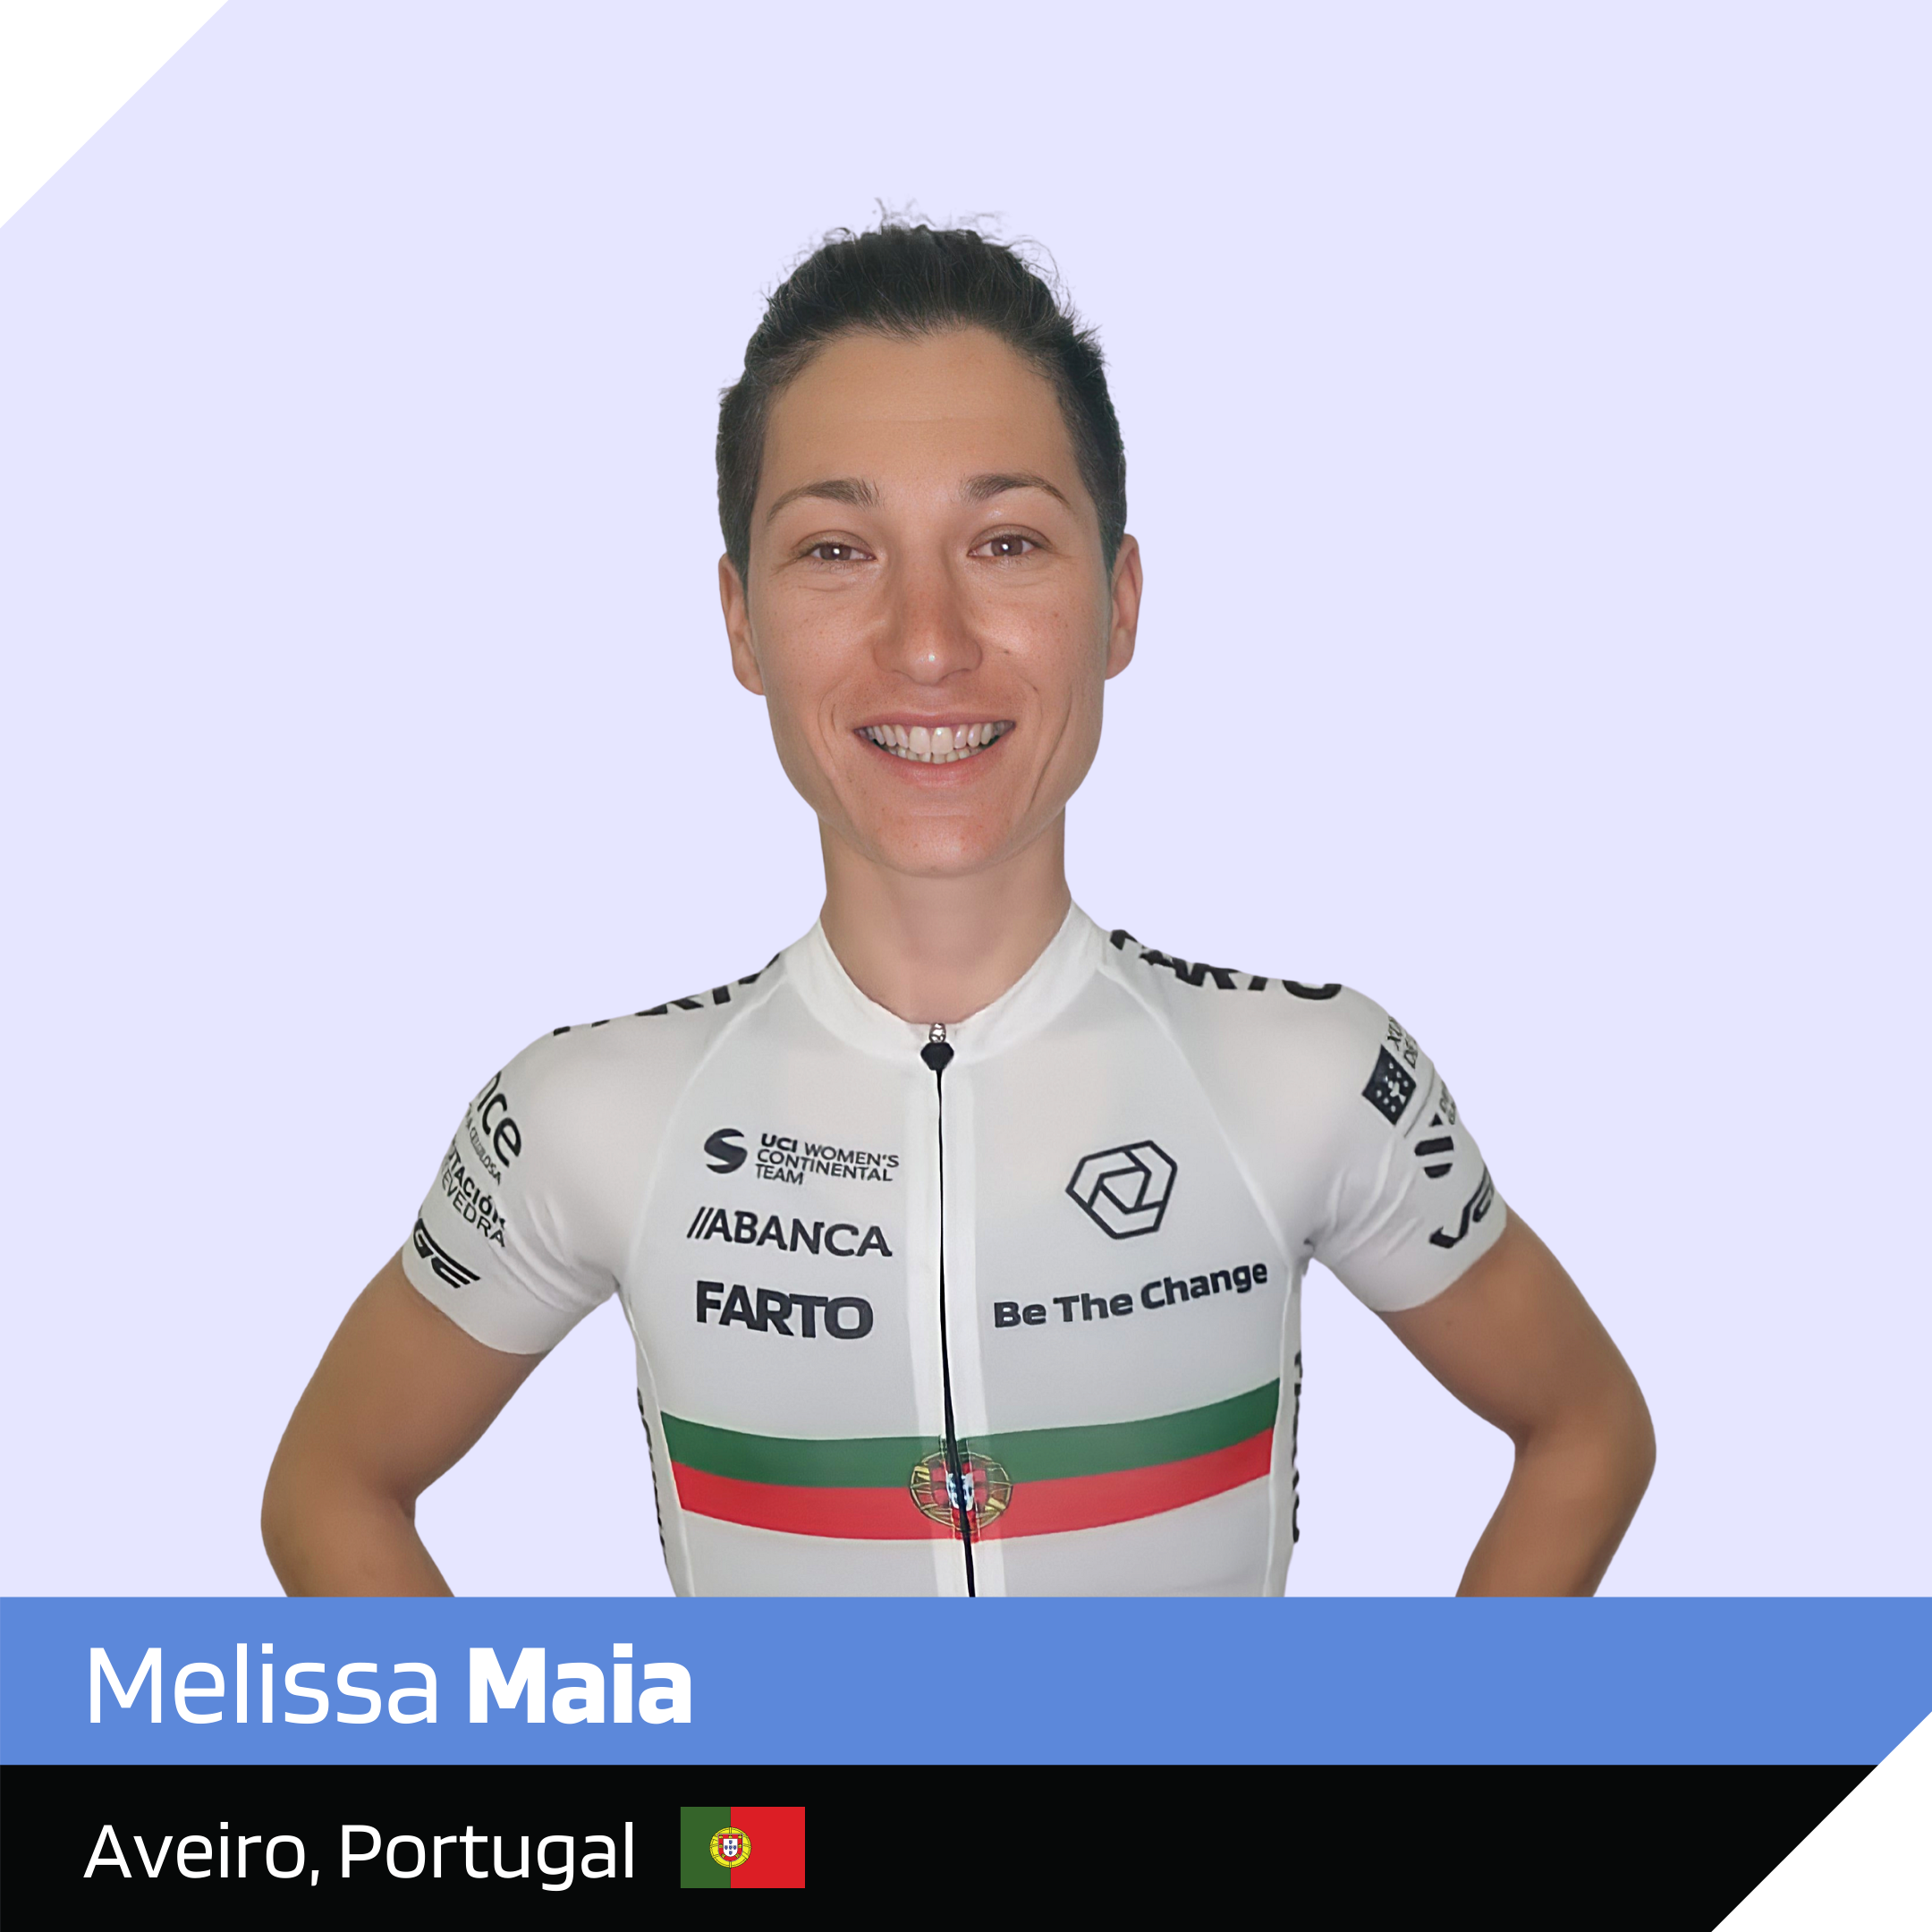 Melissa Maia